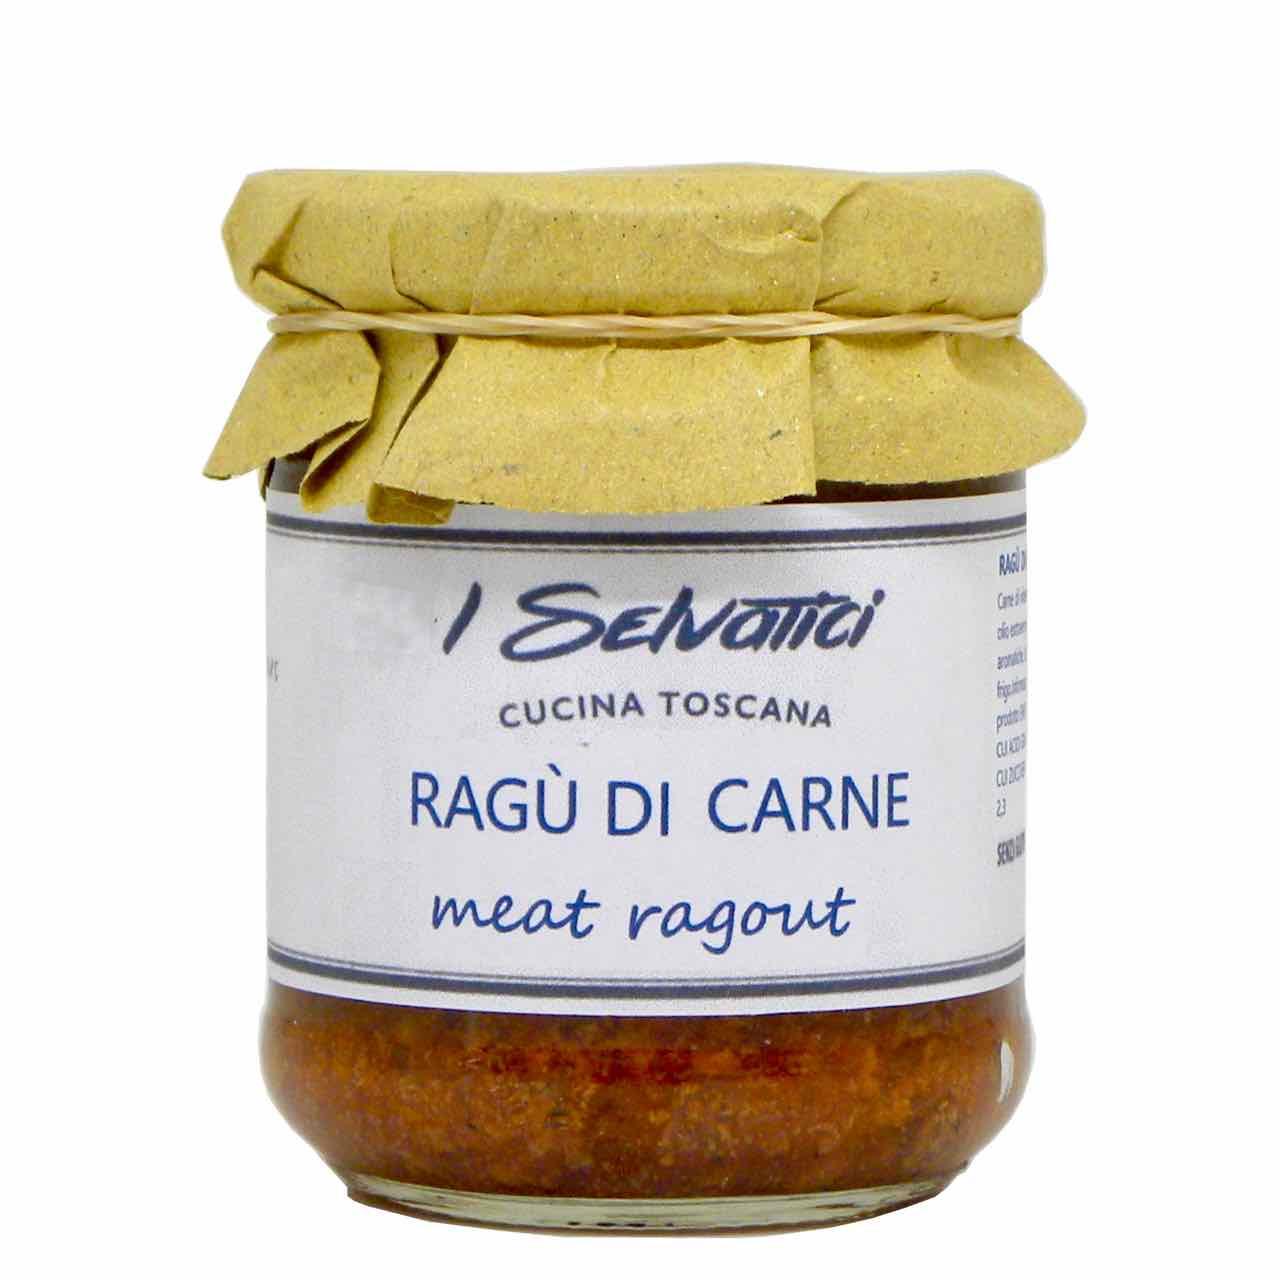 ragù di carne – Gustorotondo online shop – i migliori cibi online – vendita online dei migliori cibi italiani artigianali